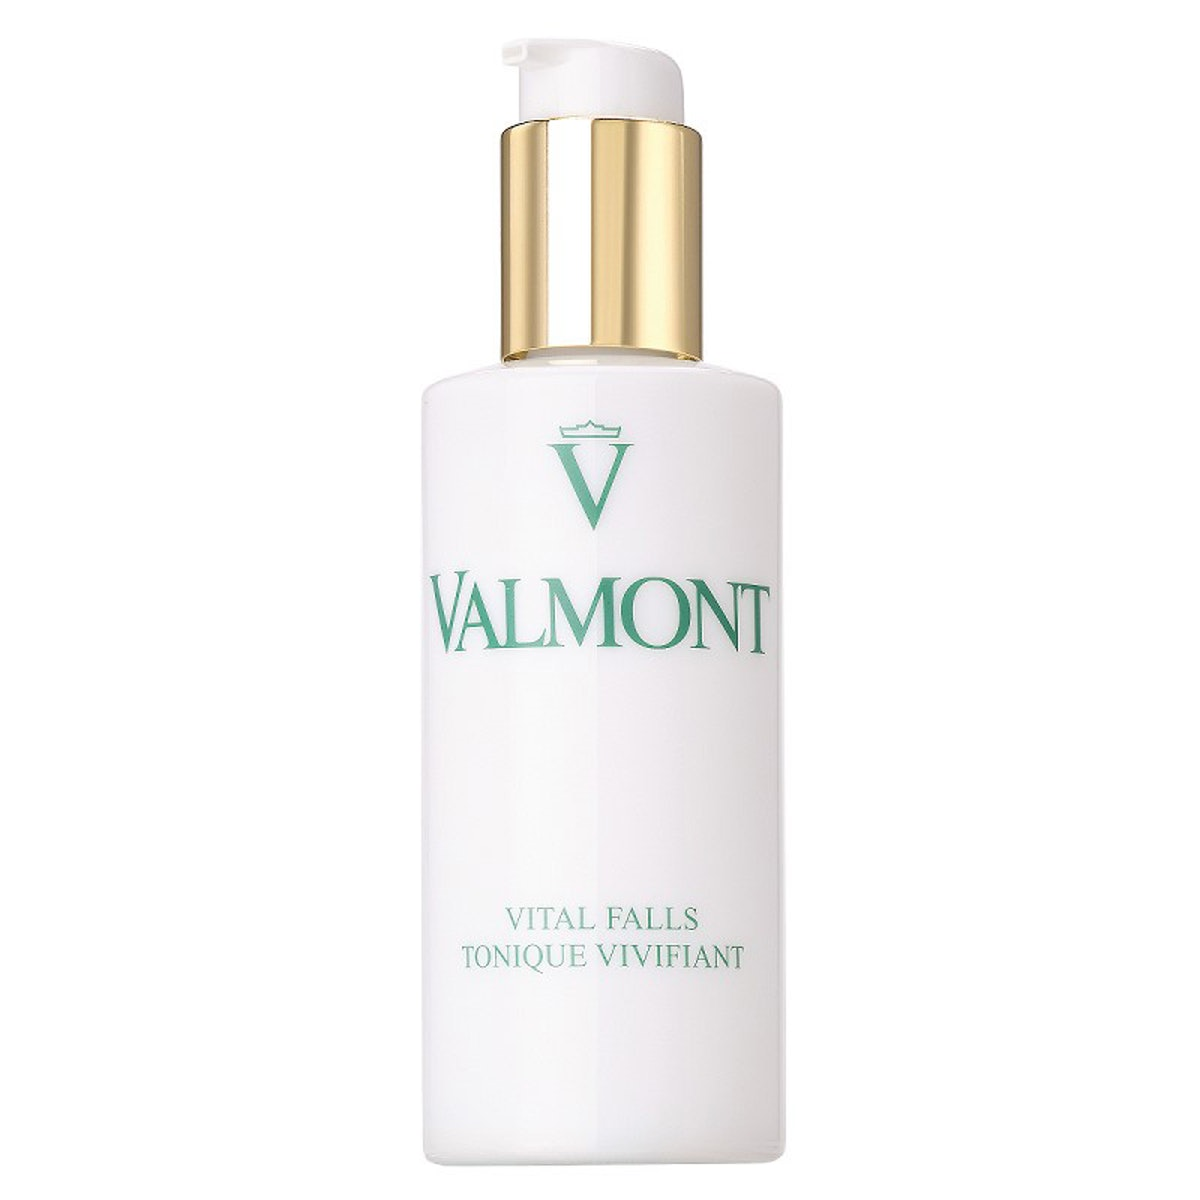 Valmont Vital Falls Invigorating Toner